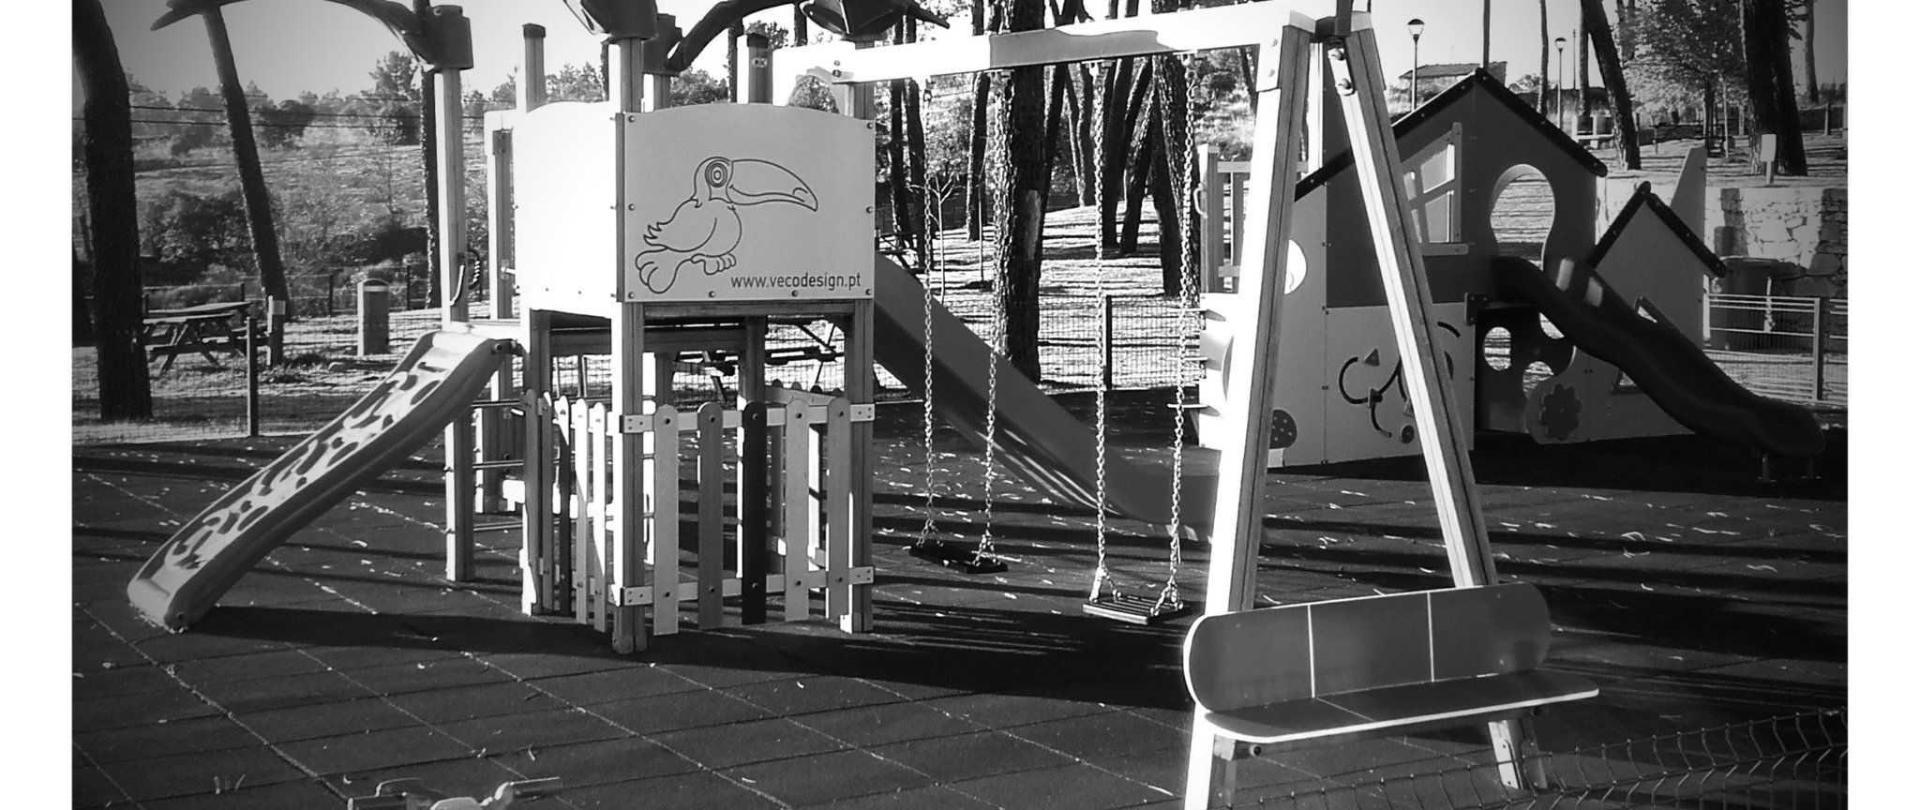 parque-infantil-iii-efects.jpg